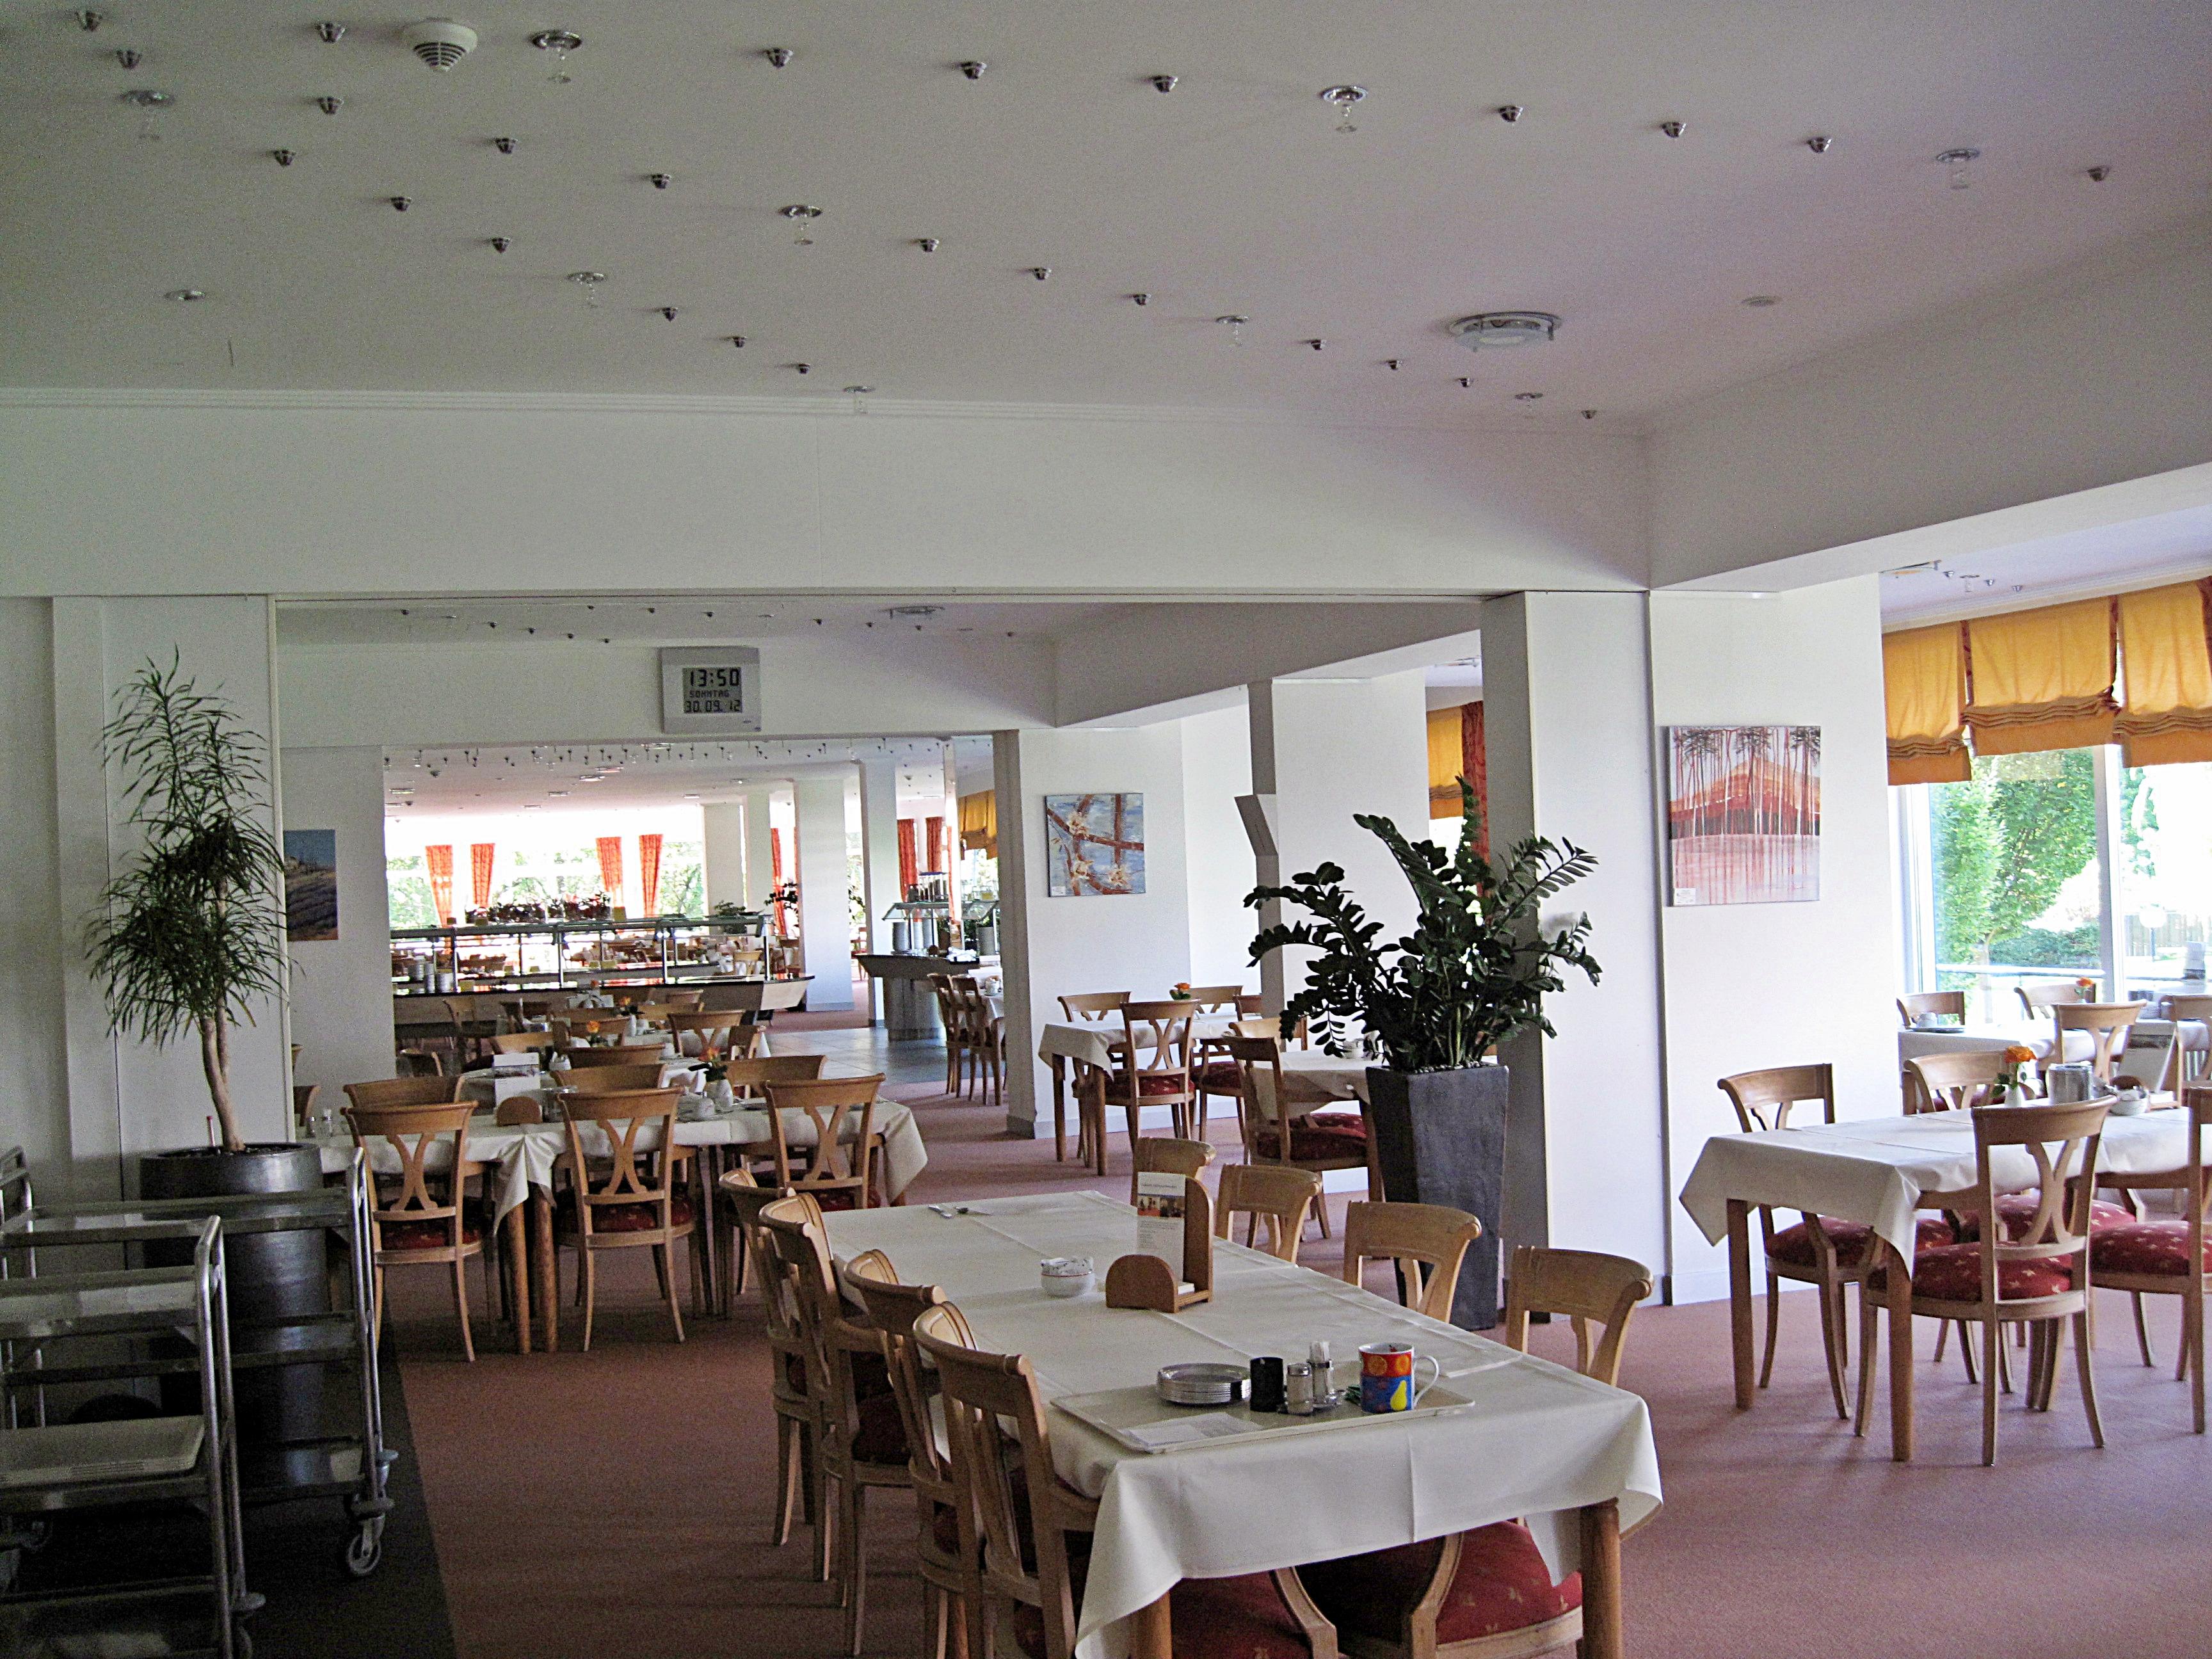 File:Bad Rothenfelde, Schüchtermannklinik, der Speisesaal ...